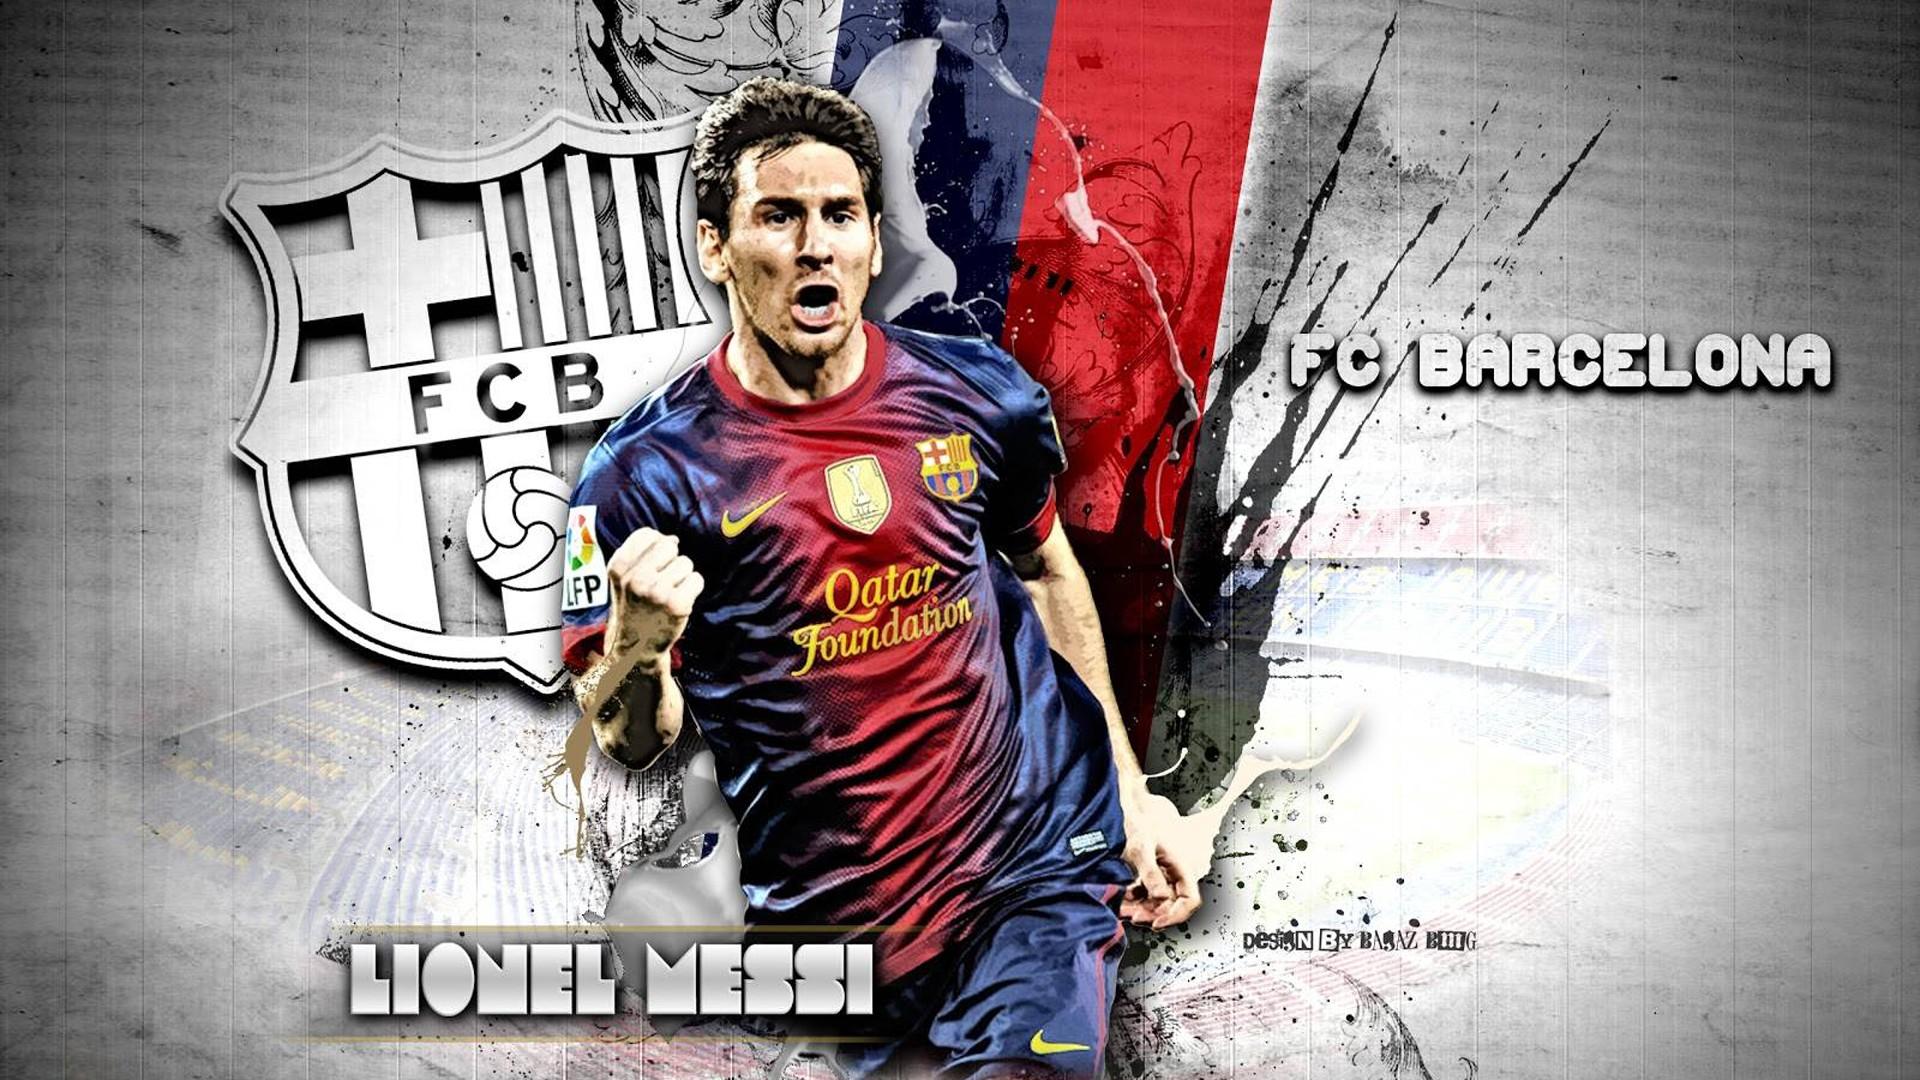 Messi Desktop Wallpapers   Wallpaper High Definition High Quality 1920x1080